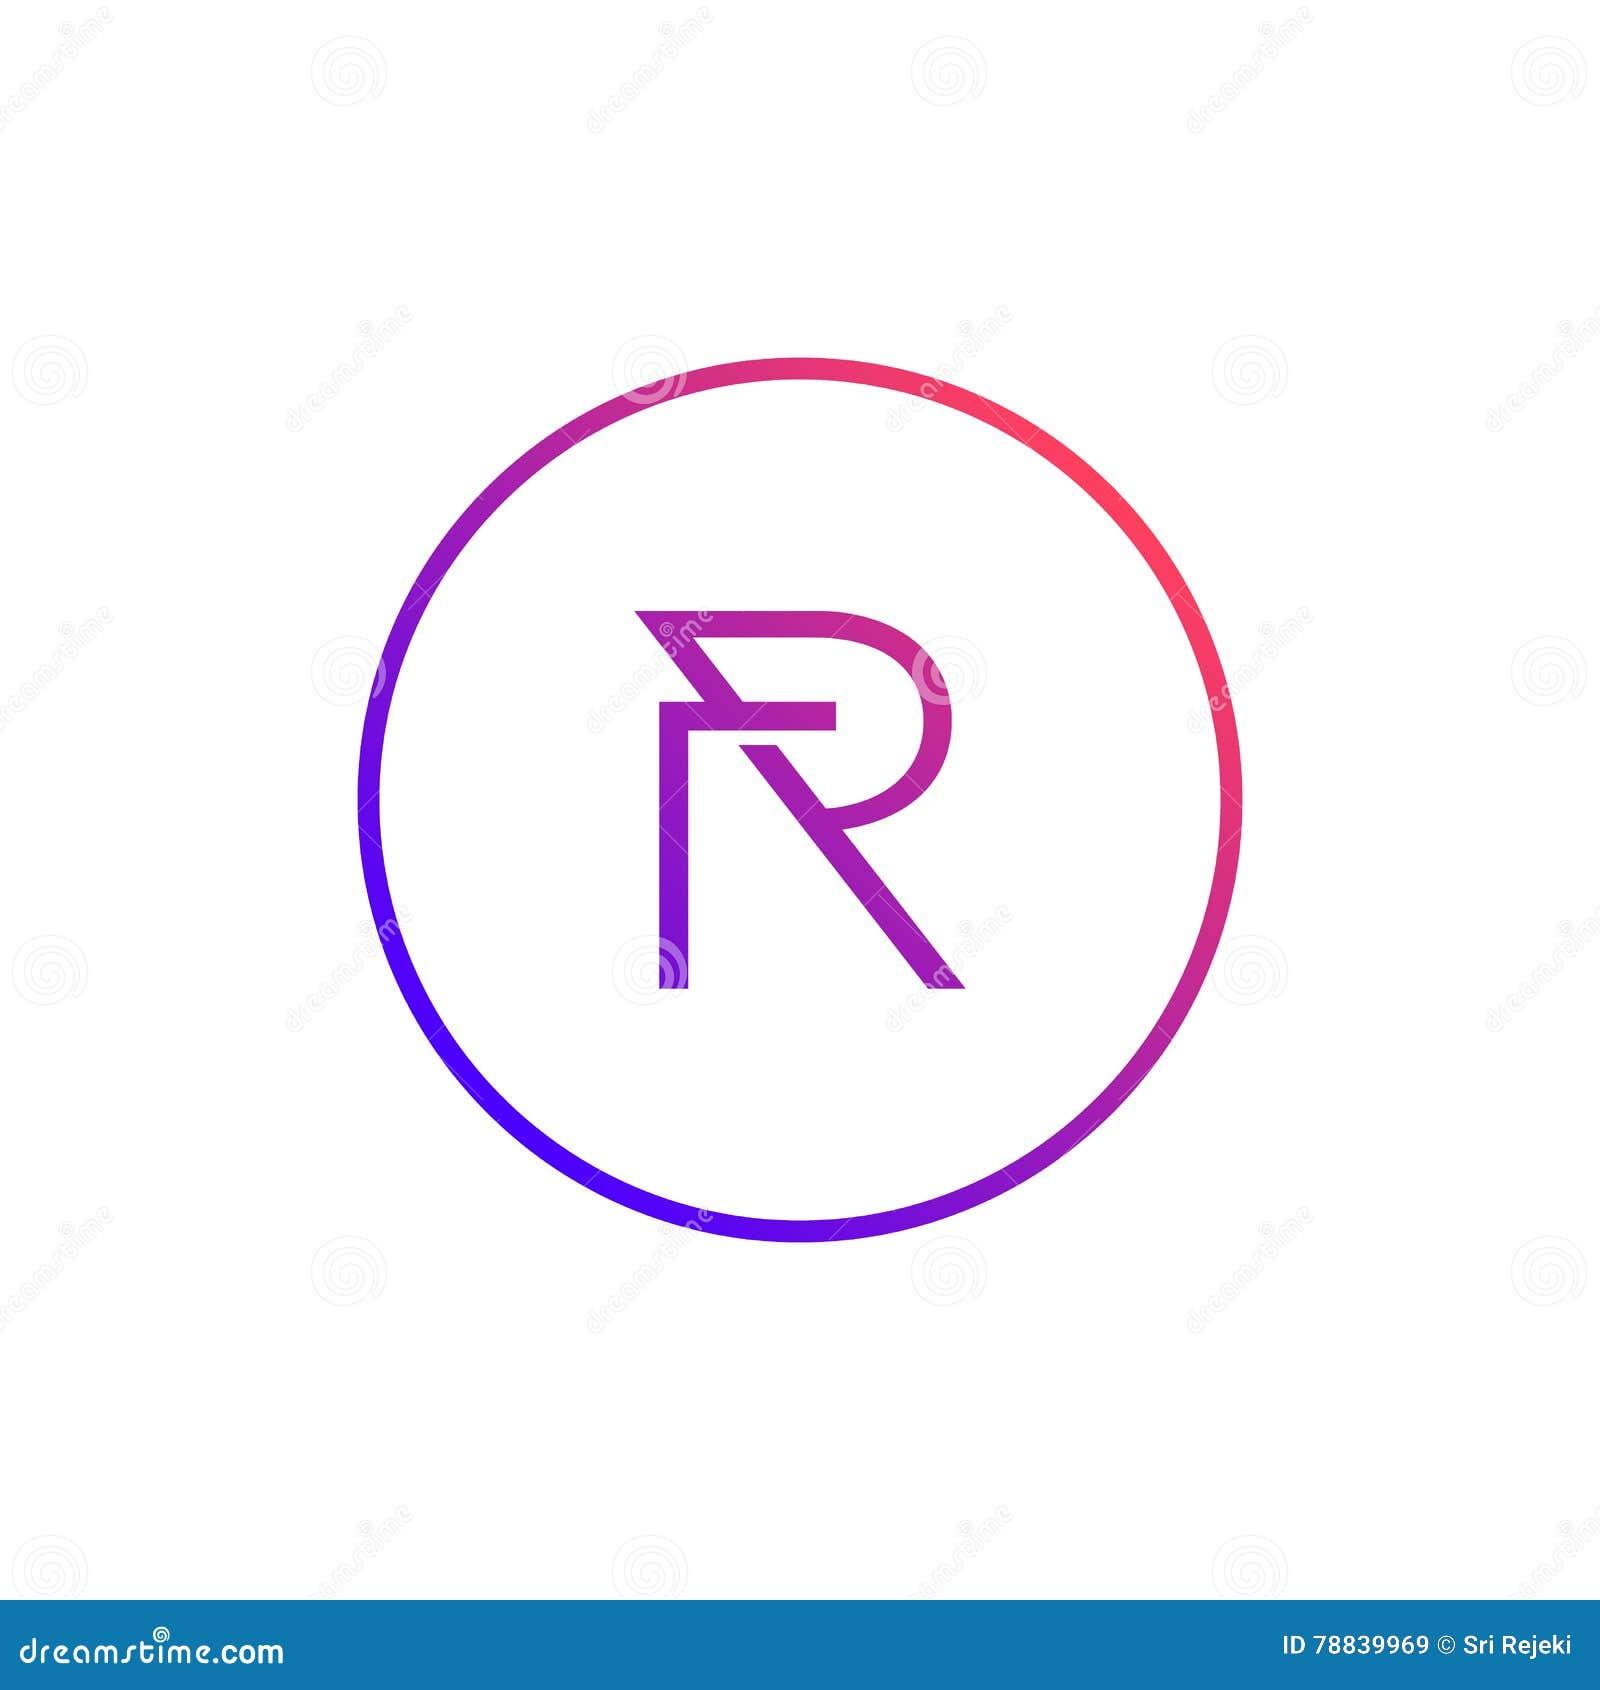 Stylish letter r images